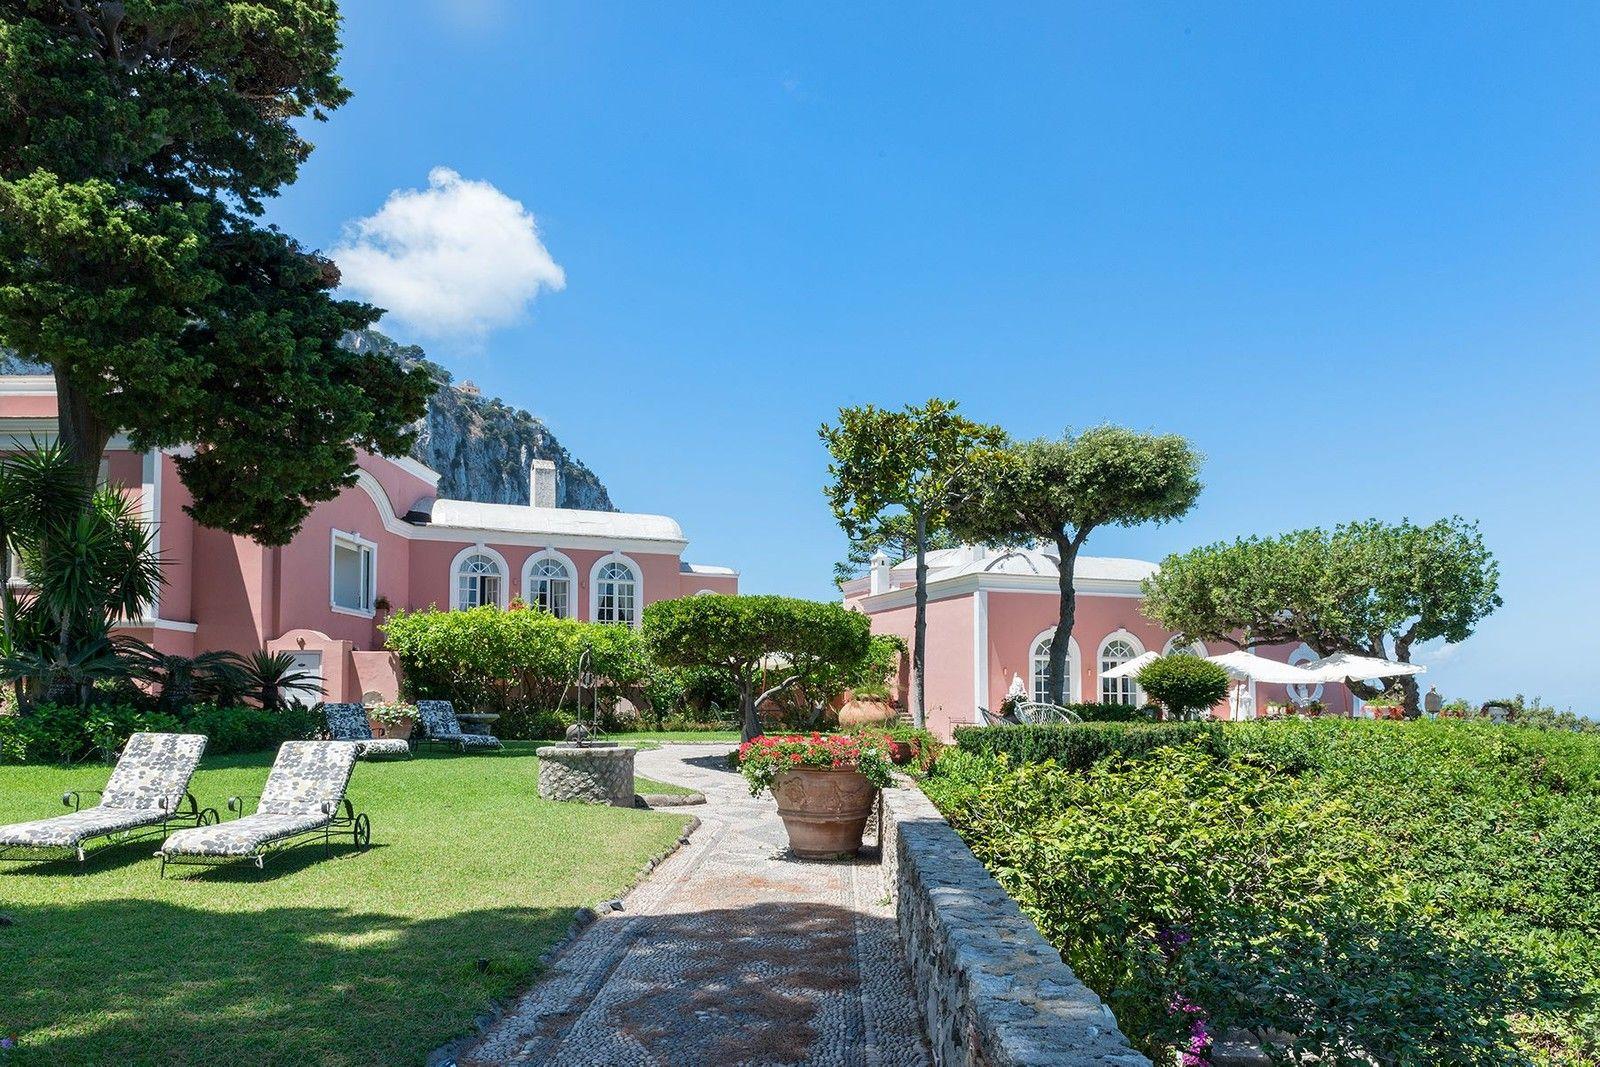 Via Palazzo a Mare Capri, Naples, Italy Luxury Home For